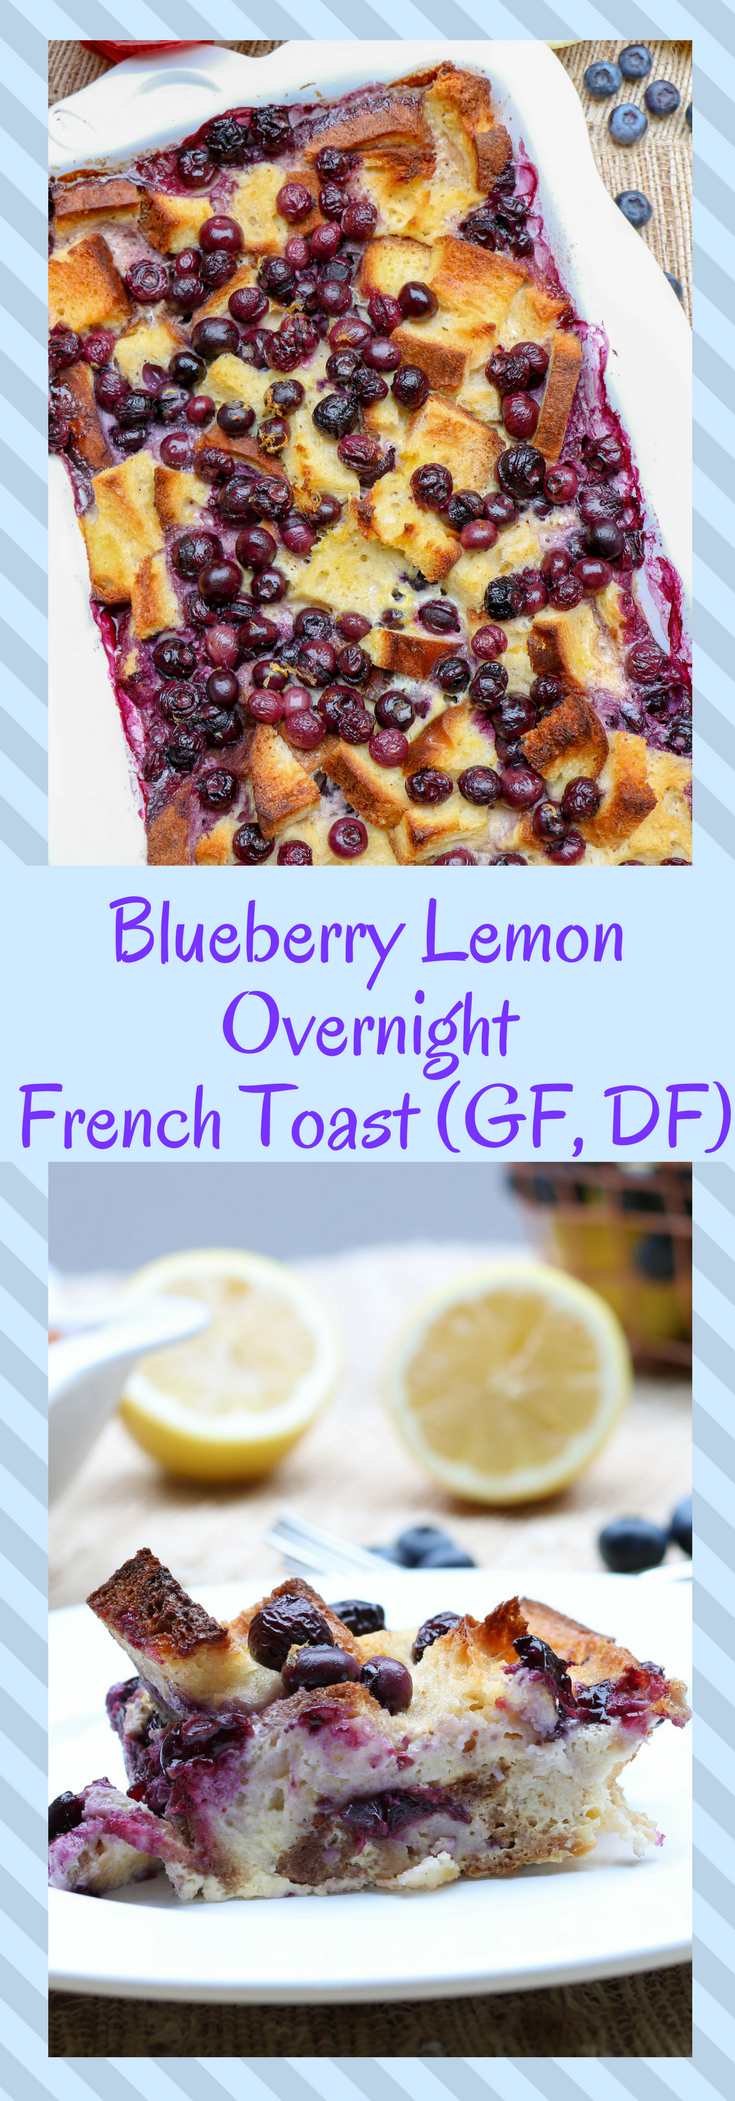 Gluten-Free & Dairy-Free Blueberry Lemon overnight french toast casserole. Takes 10 minutes to assemble, crowd pleaser. #ad #food #glutenfree #dairyfree #breakfast